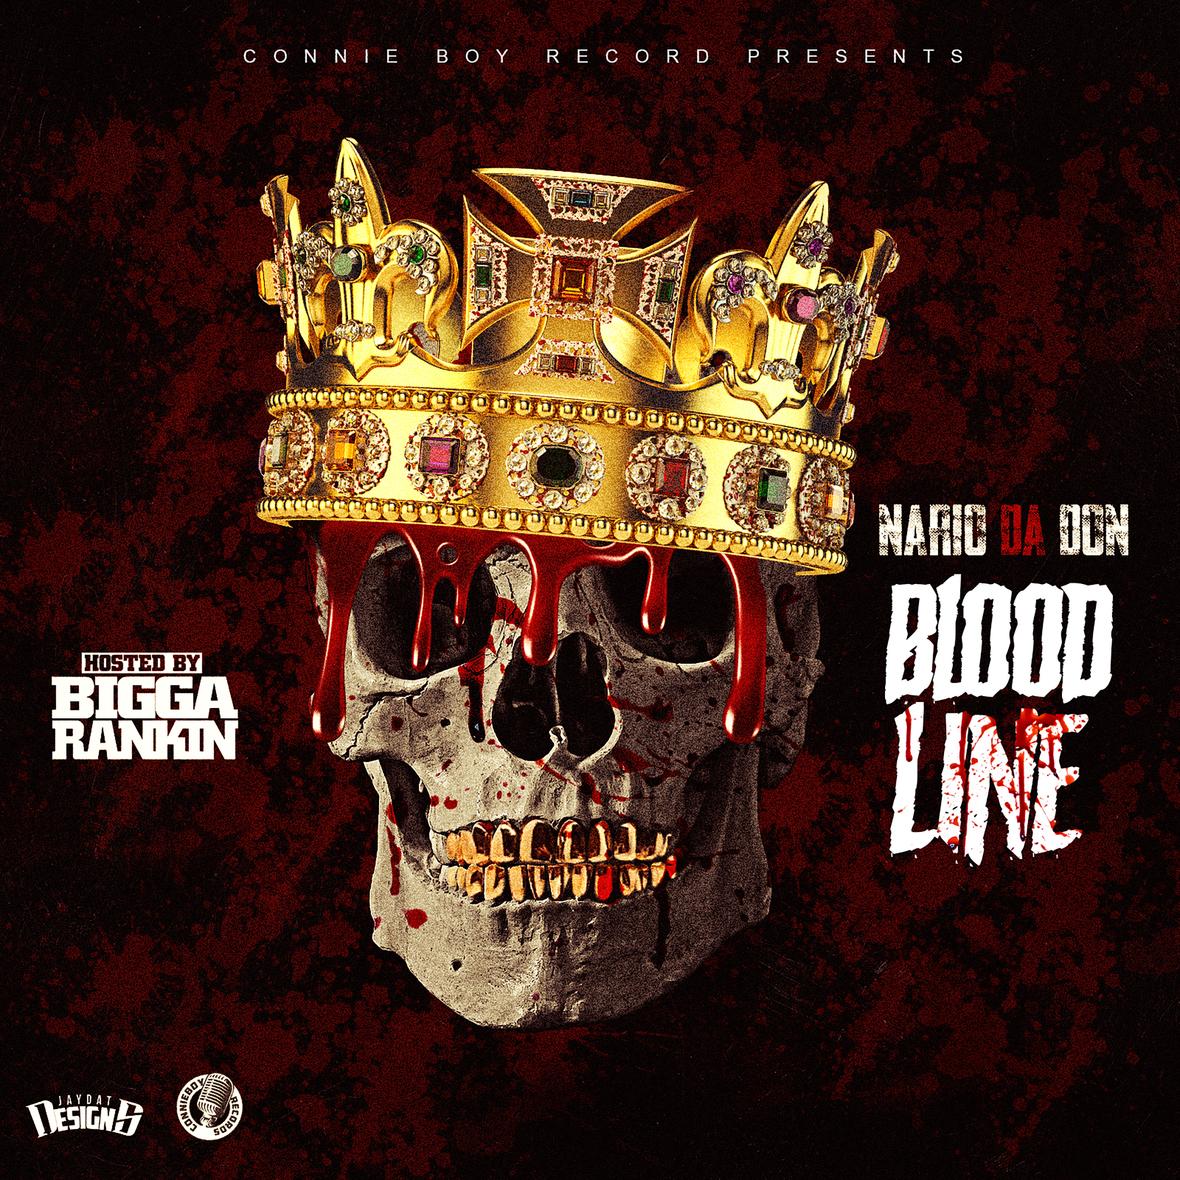 Bloodline Front Explicit